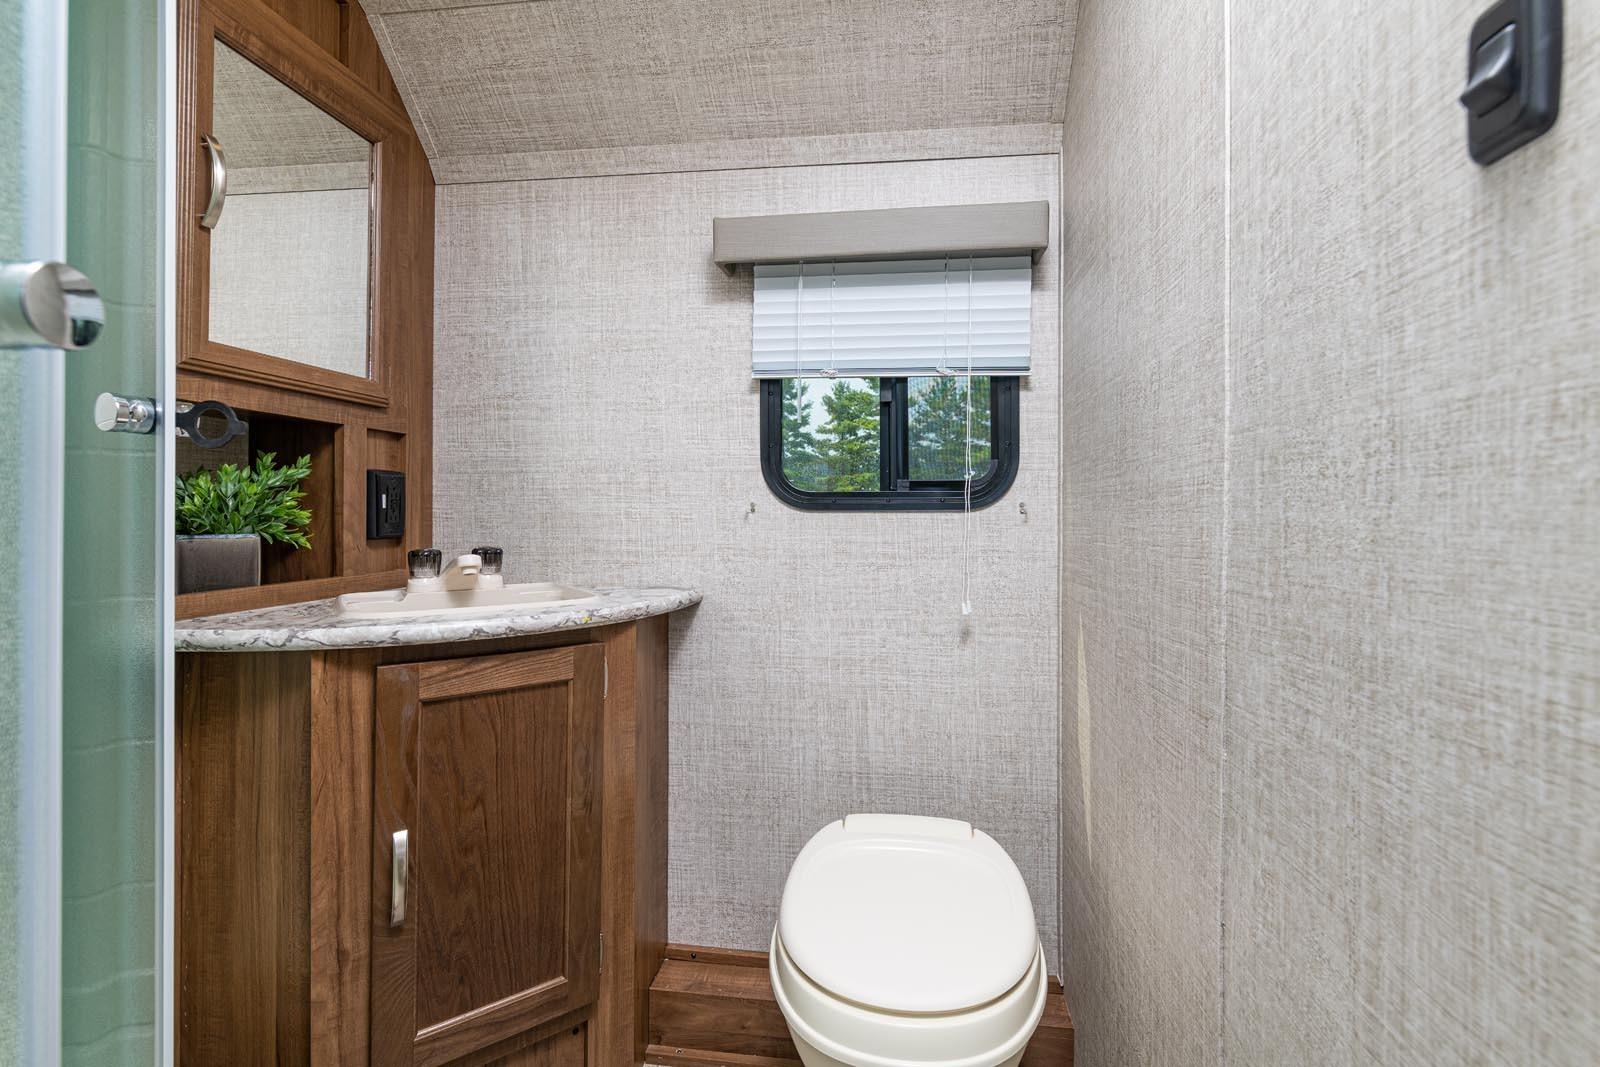 21 23bhs vc bathroom